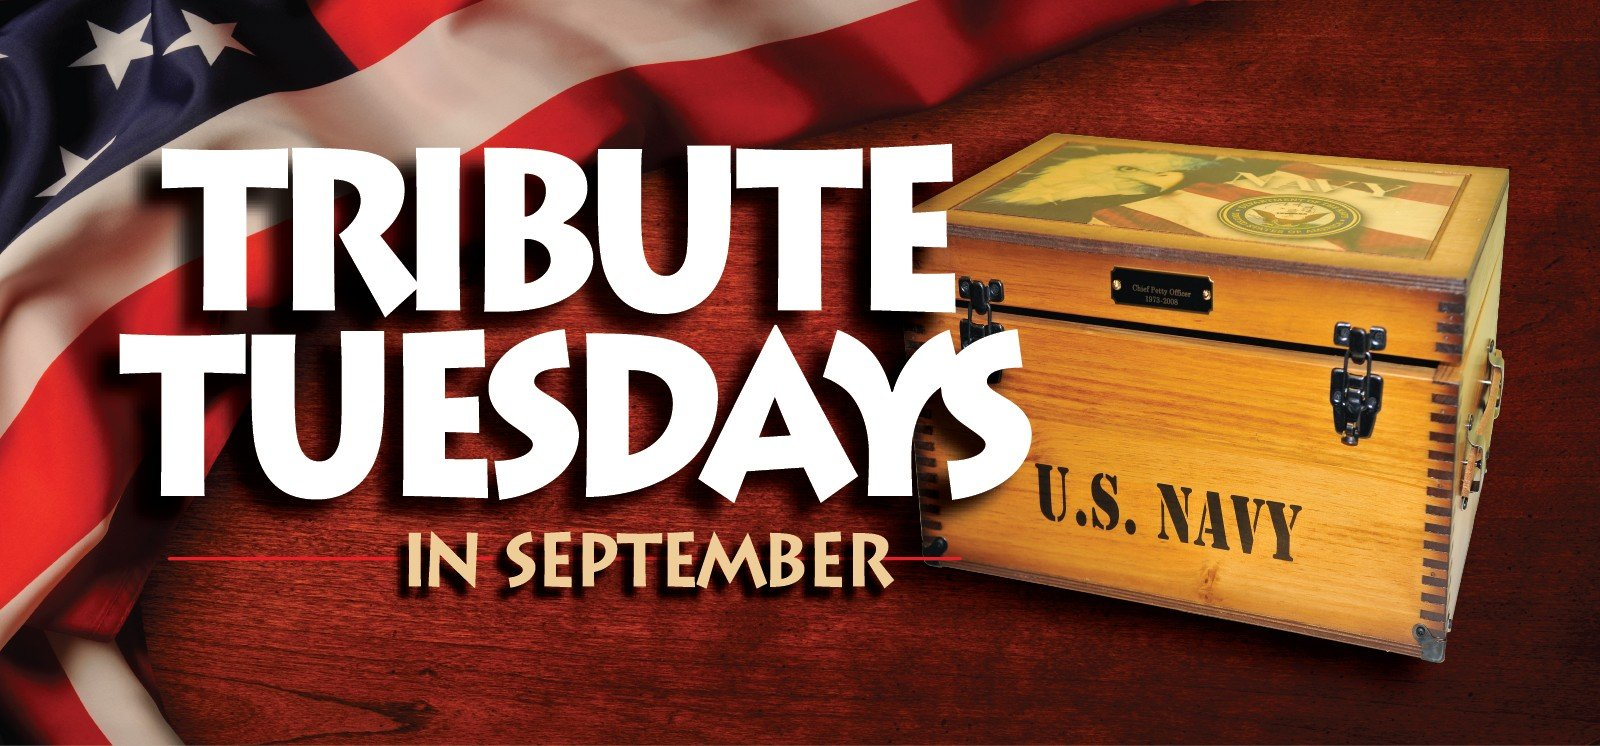 Web Header Promotion - September Tribute Tuesdays